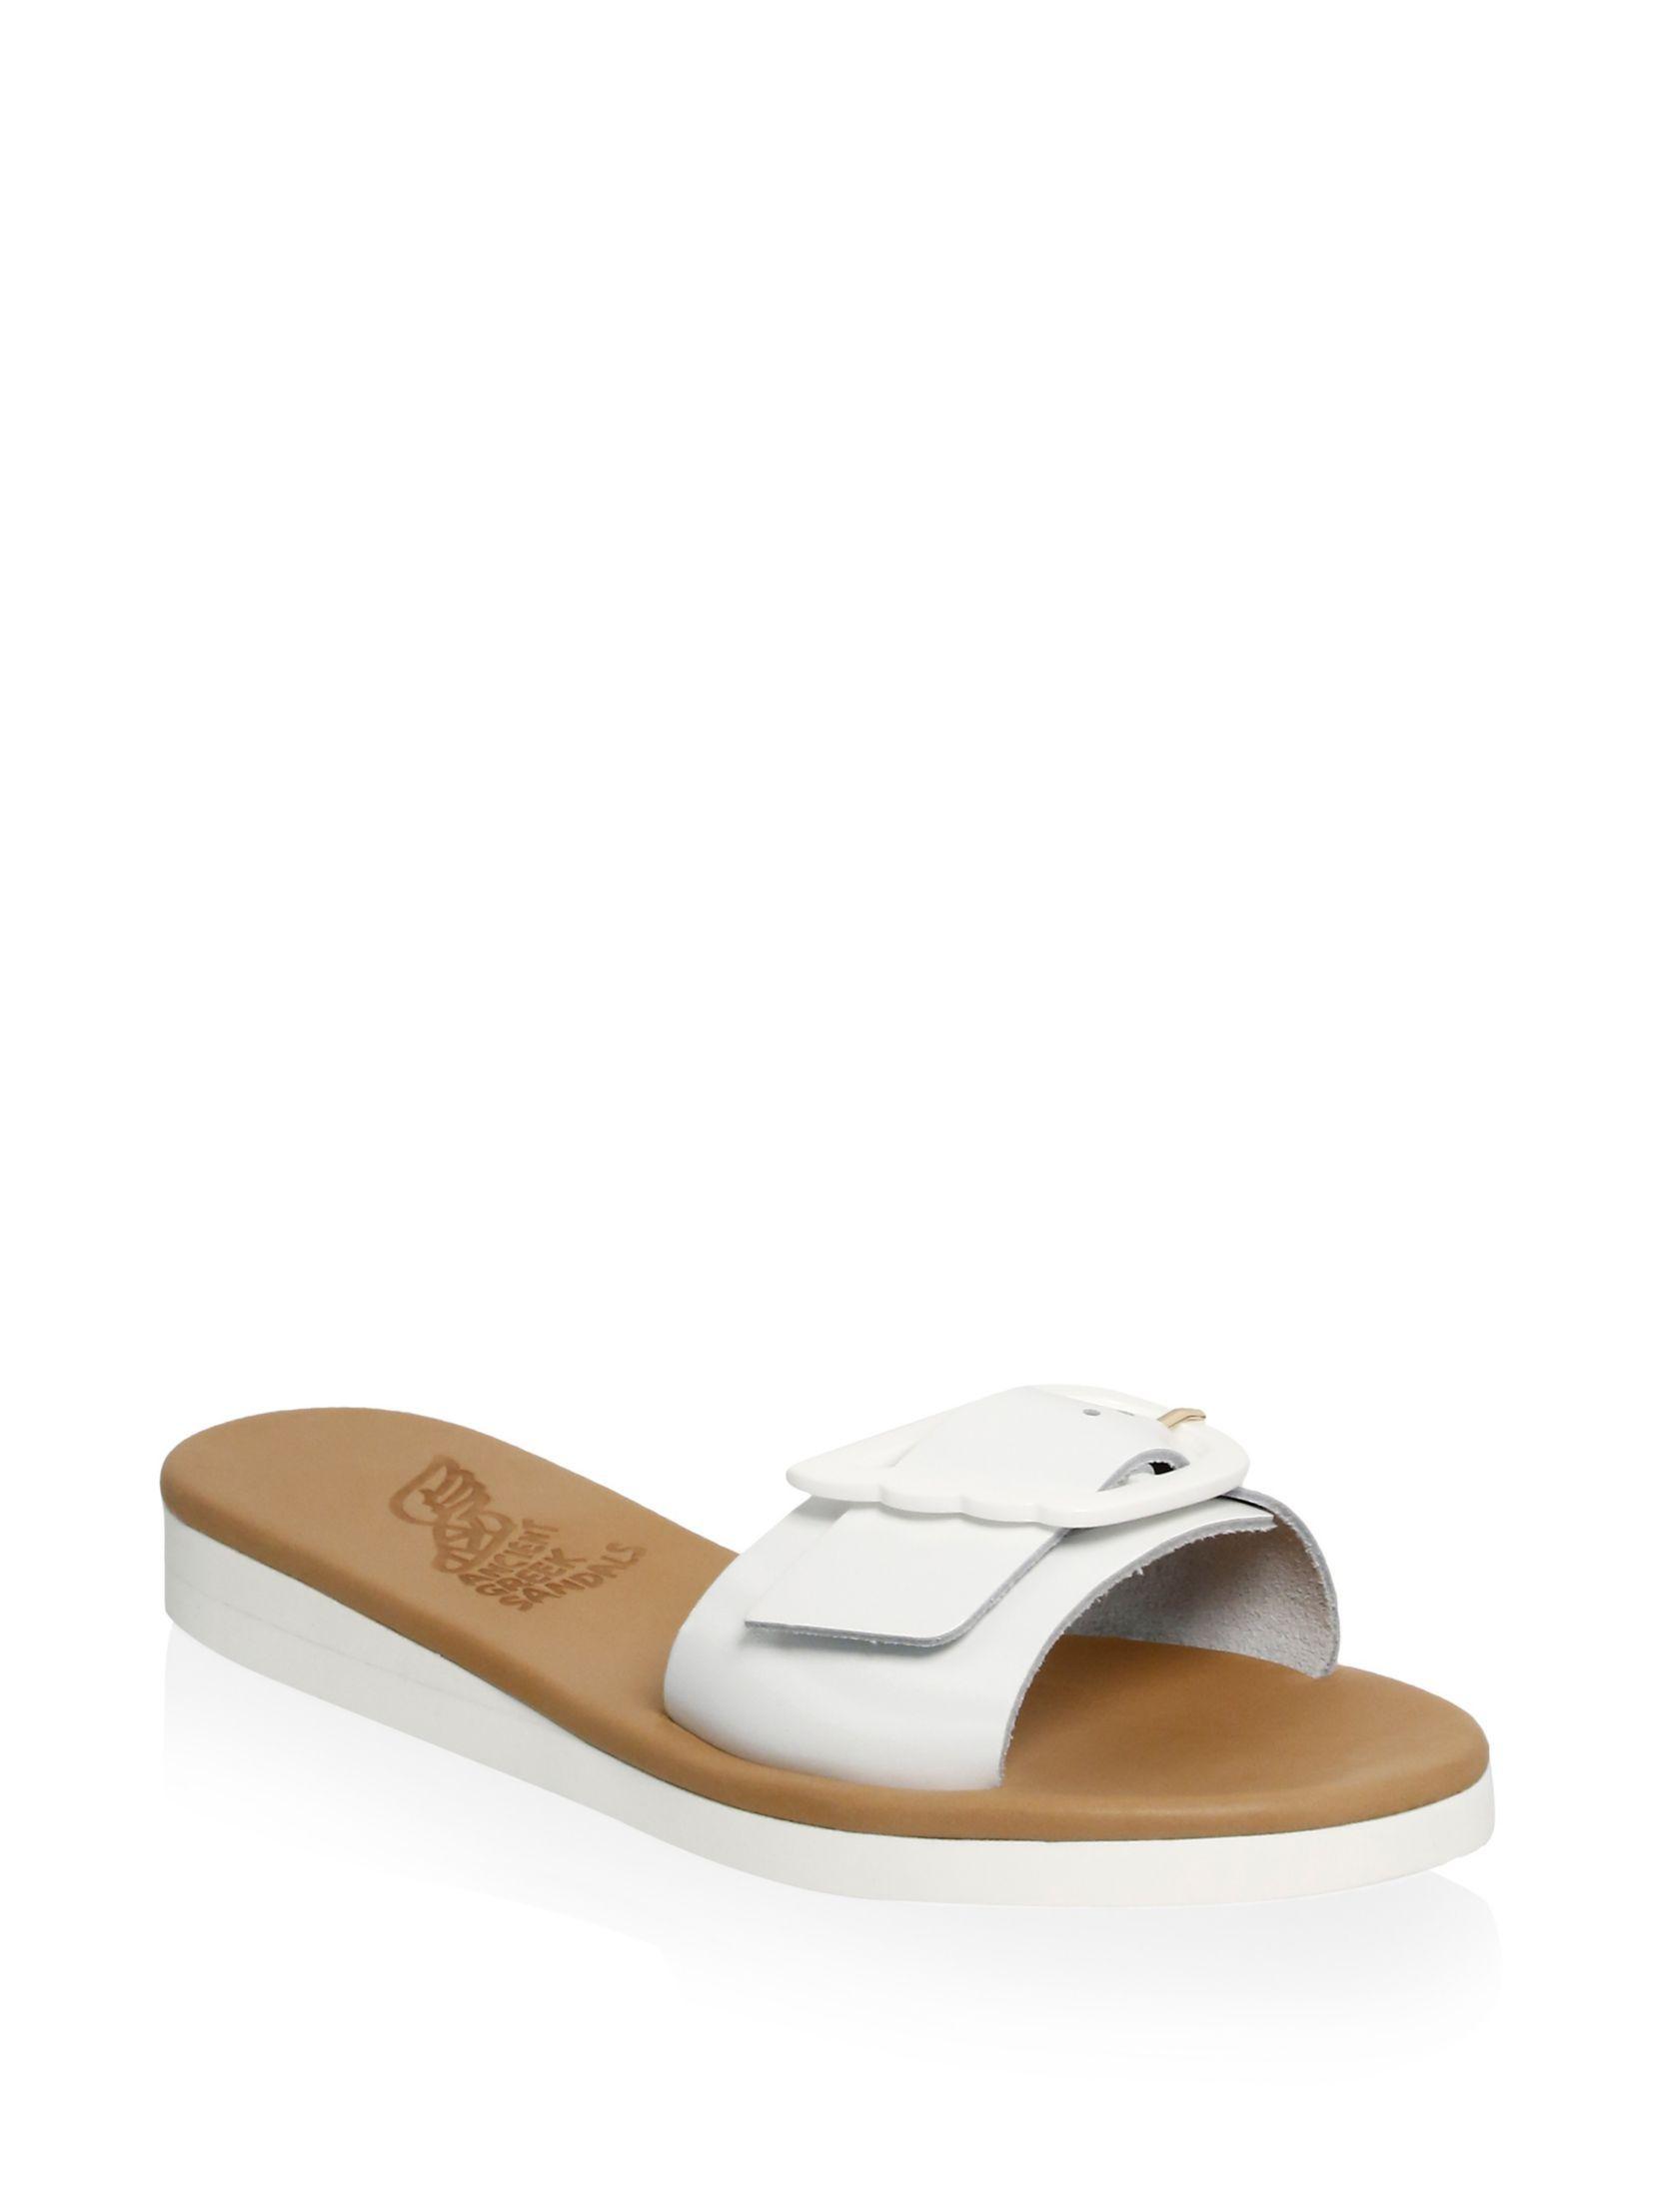 Ancient Greek Sandals Aglaia Buckle Leather Slide Sandals ybBZYbp